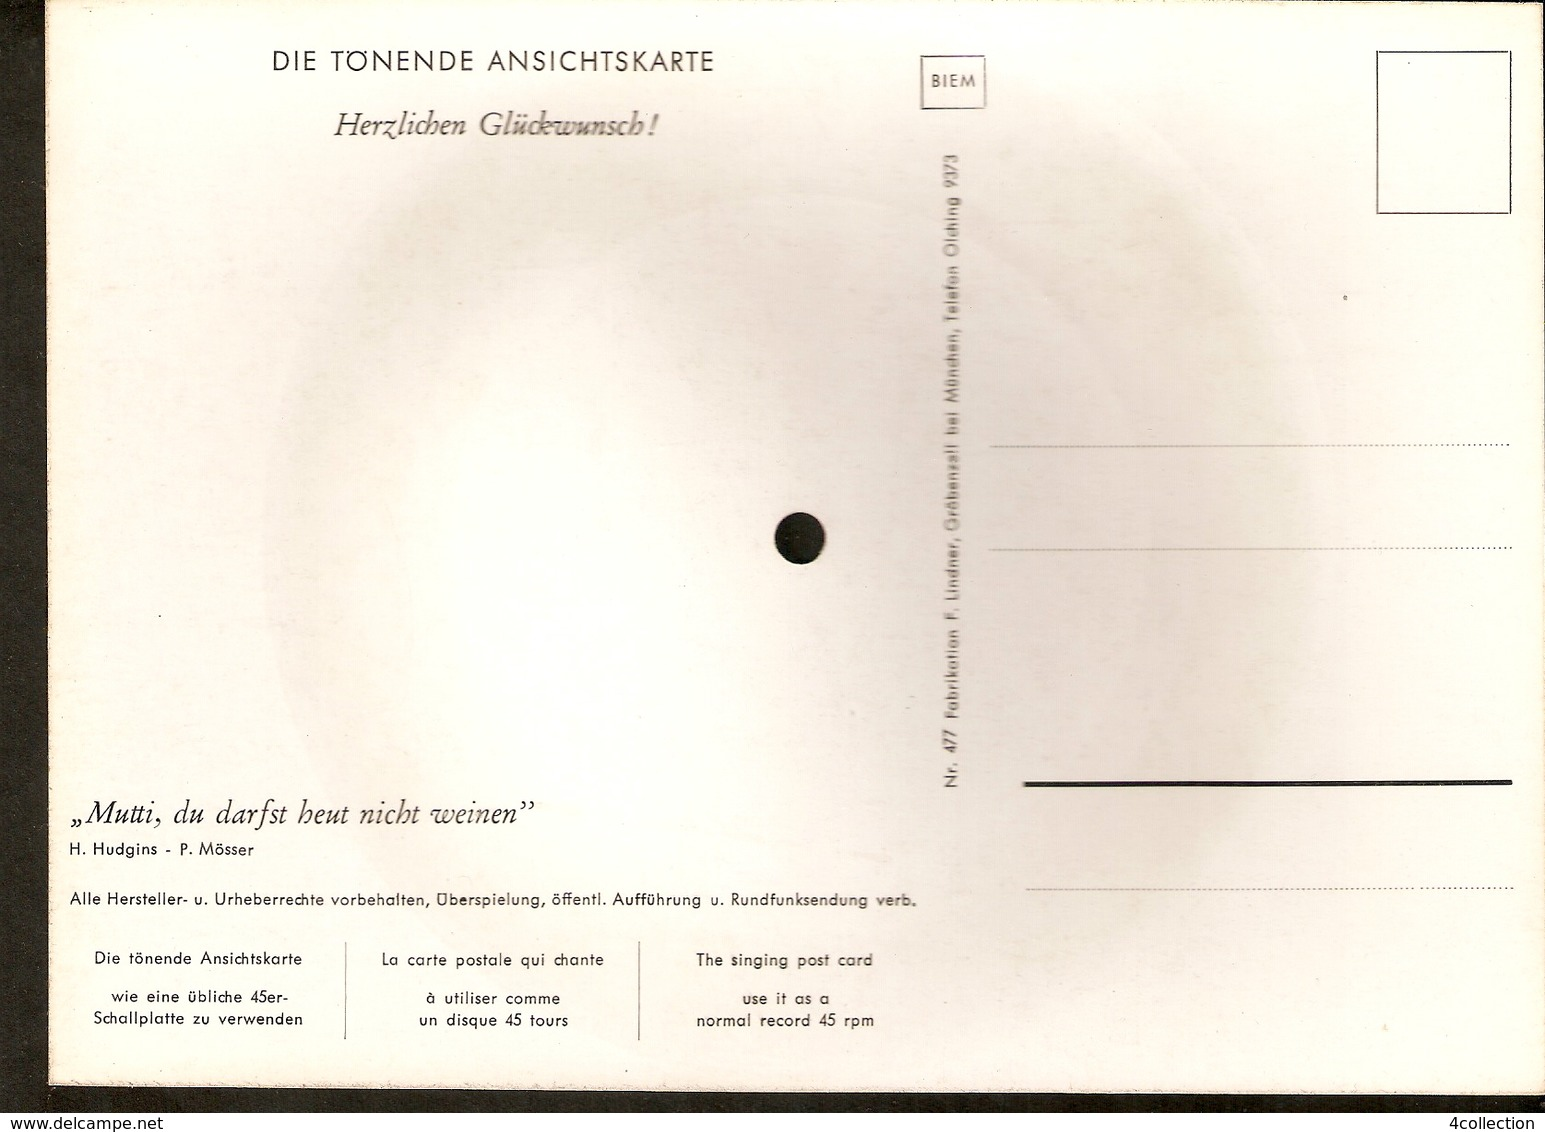 Old Musical 45rpm Record Postcard Herzlichen Gluckwunsch Hudgins Mosser Mutti Du Darfst Heut Nicht Weinen - Unclassified